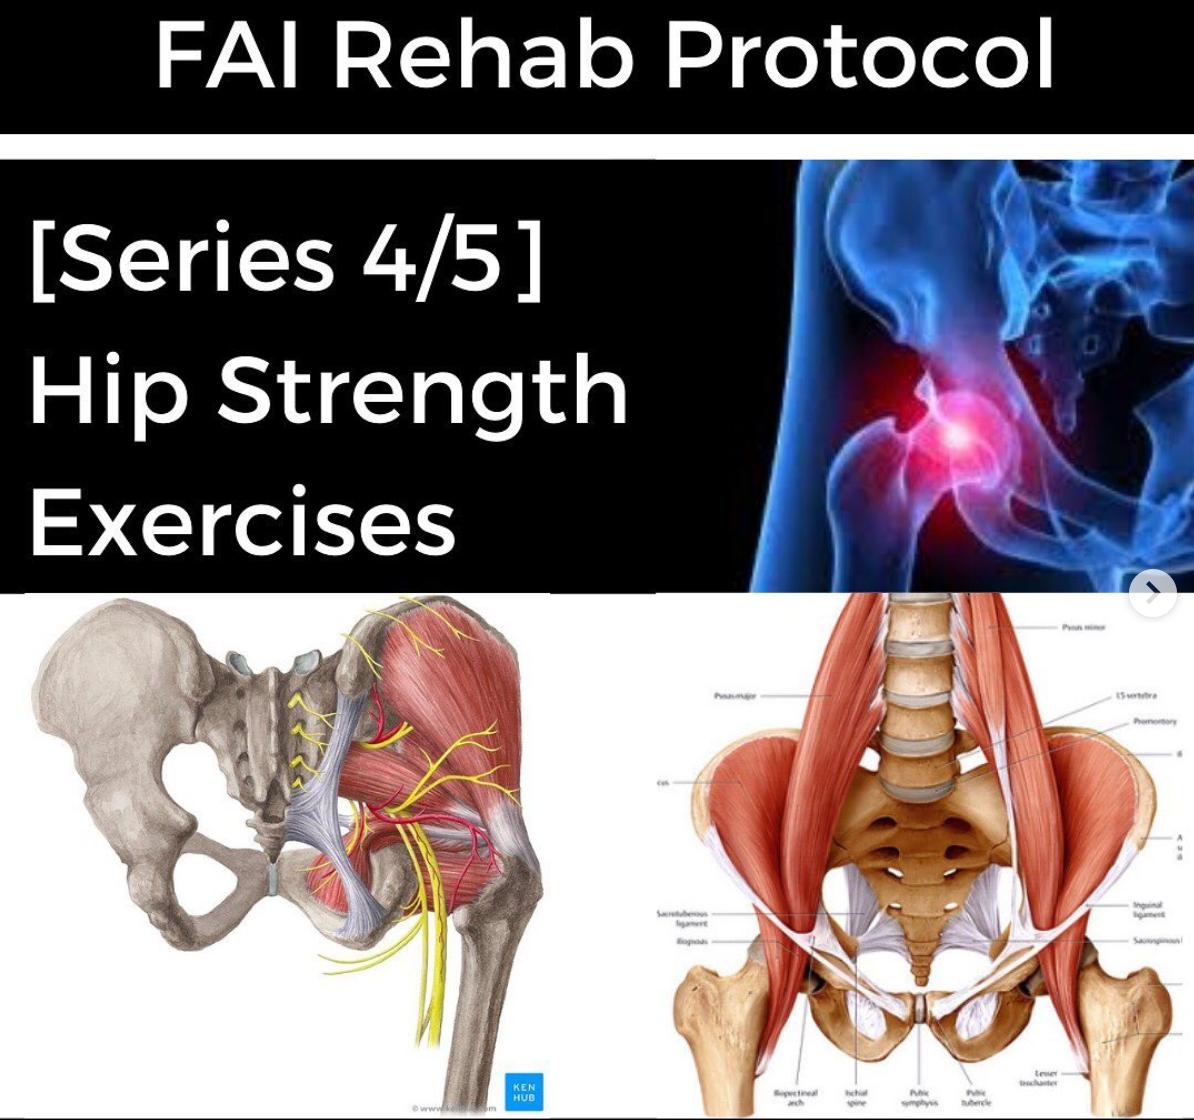 FAI Rehab Protocol Part 4 - Hip Strength Exercises - themanualtherapist.com